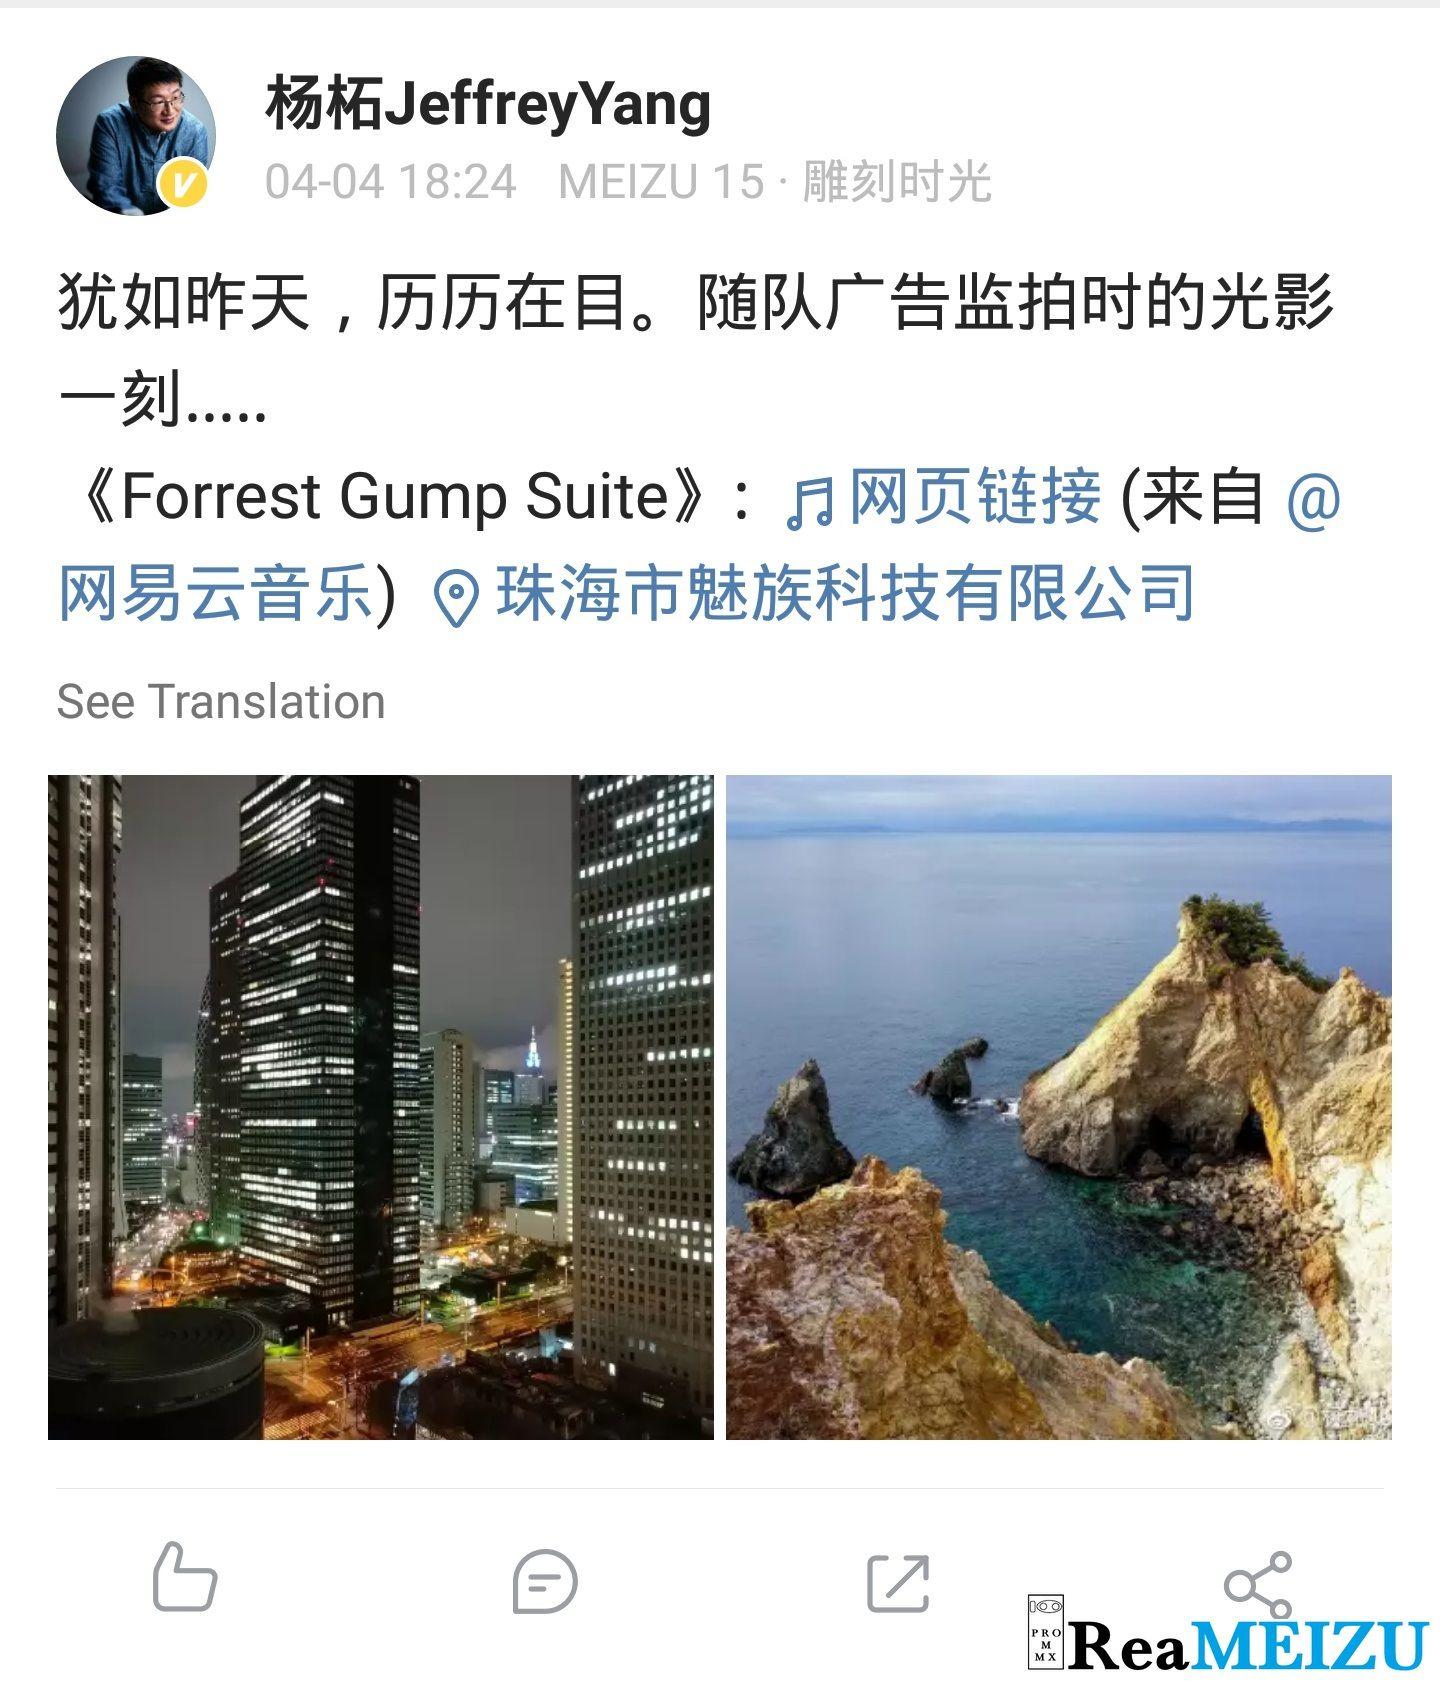 MEIZUの副総裁がMeizu 15を使って微博に投稿。サンプルフォトらしき画像を公開